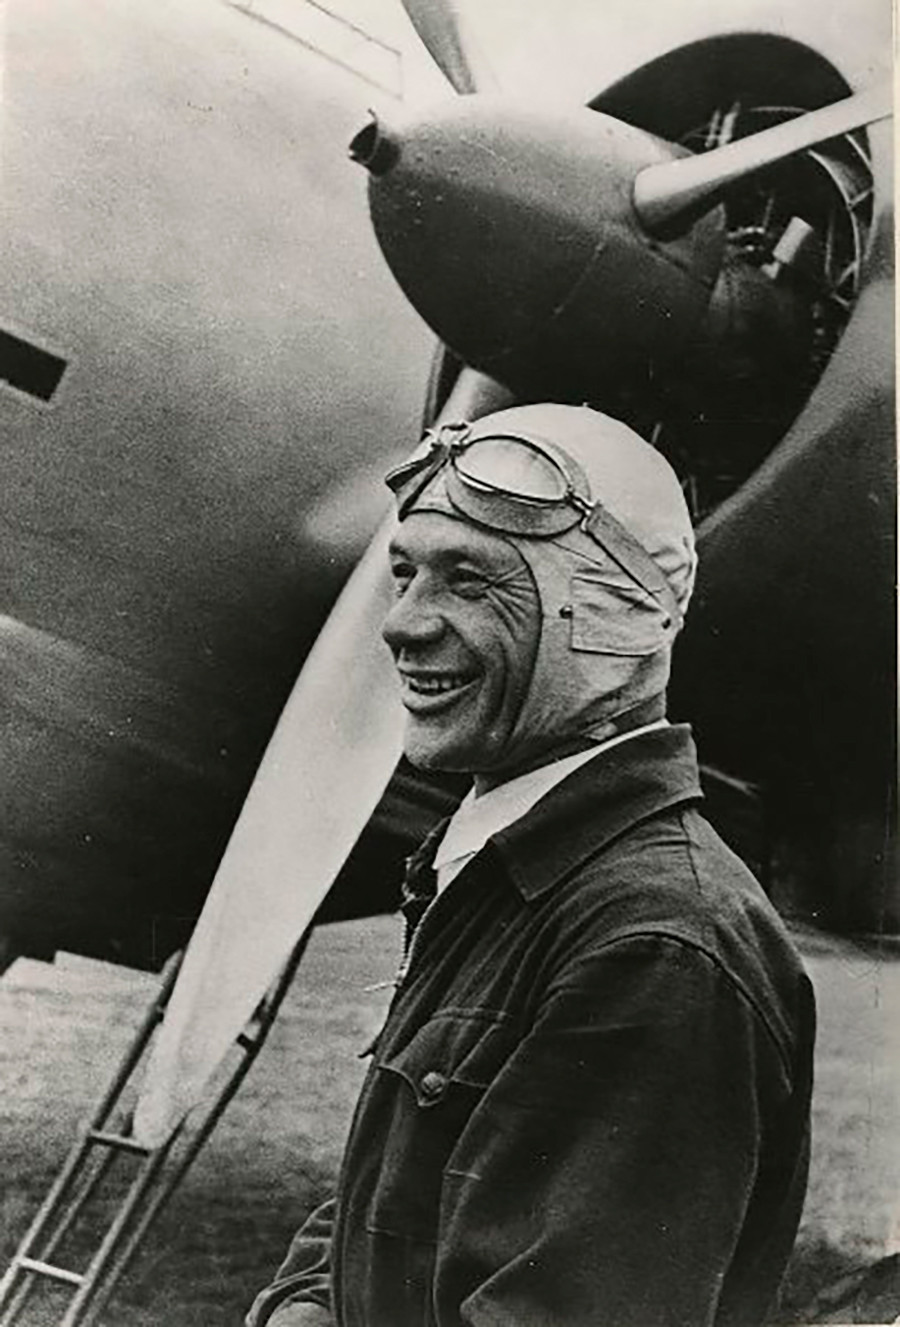 Le pilote d'essai soviétique Vladimir Kokkinaki, 1937